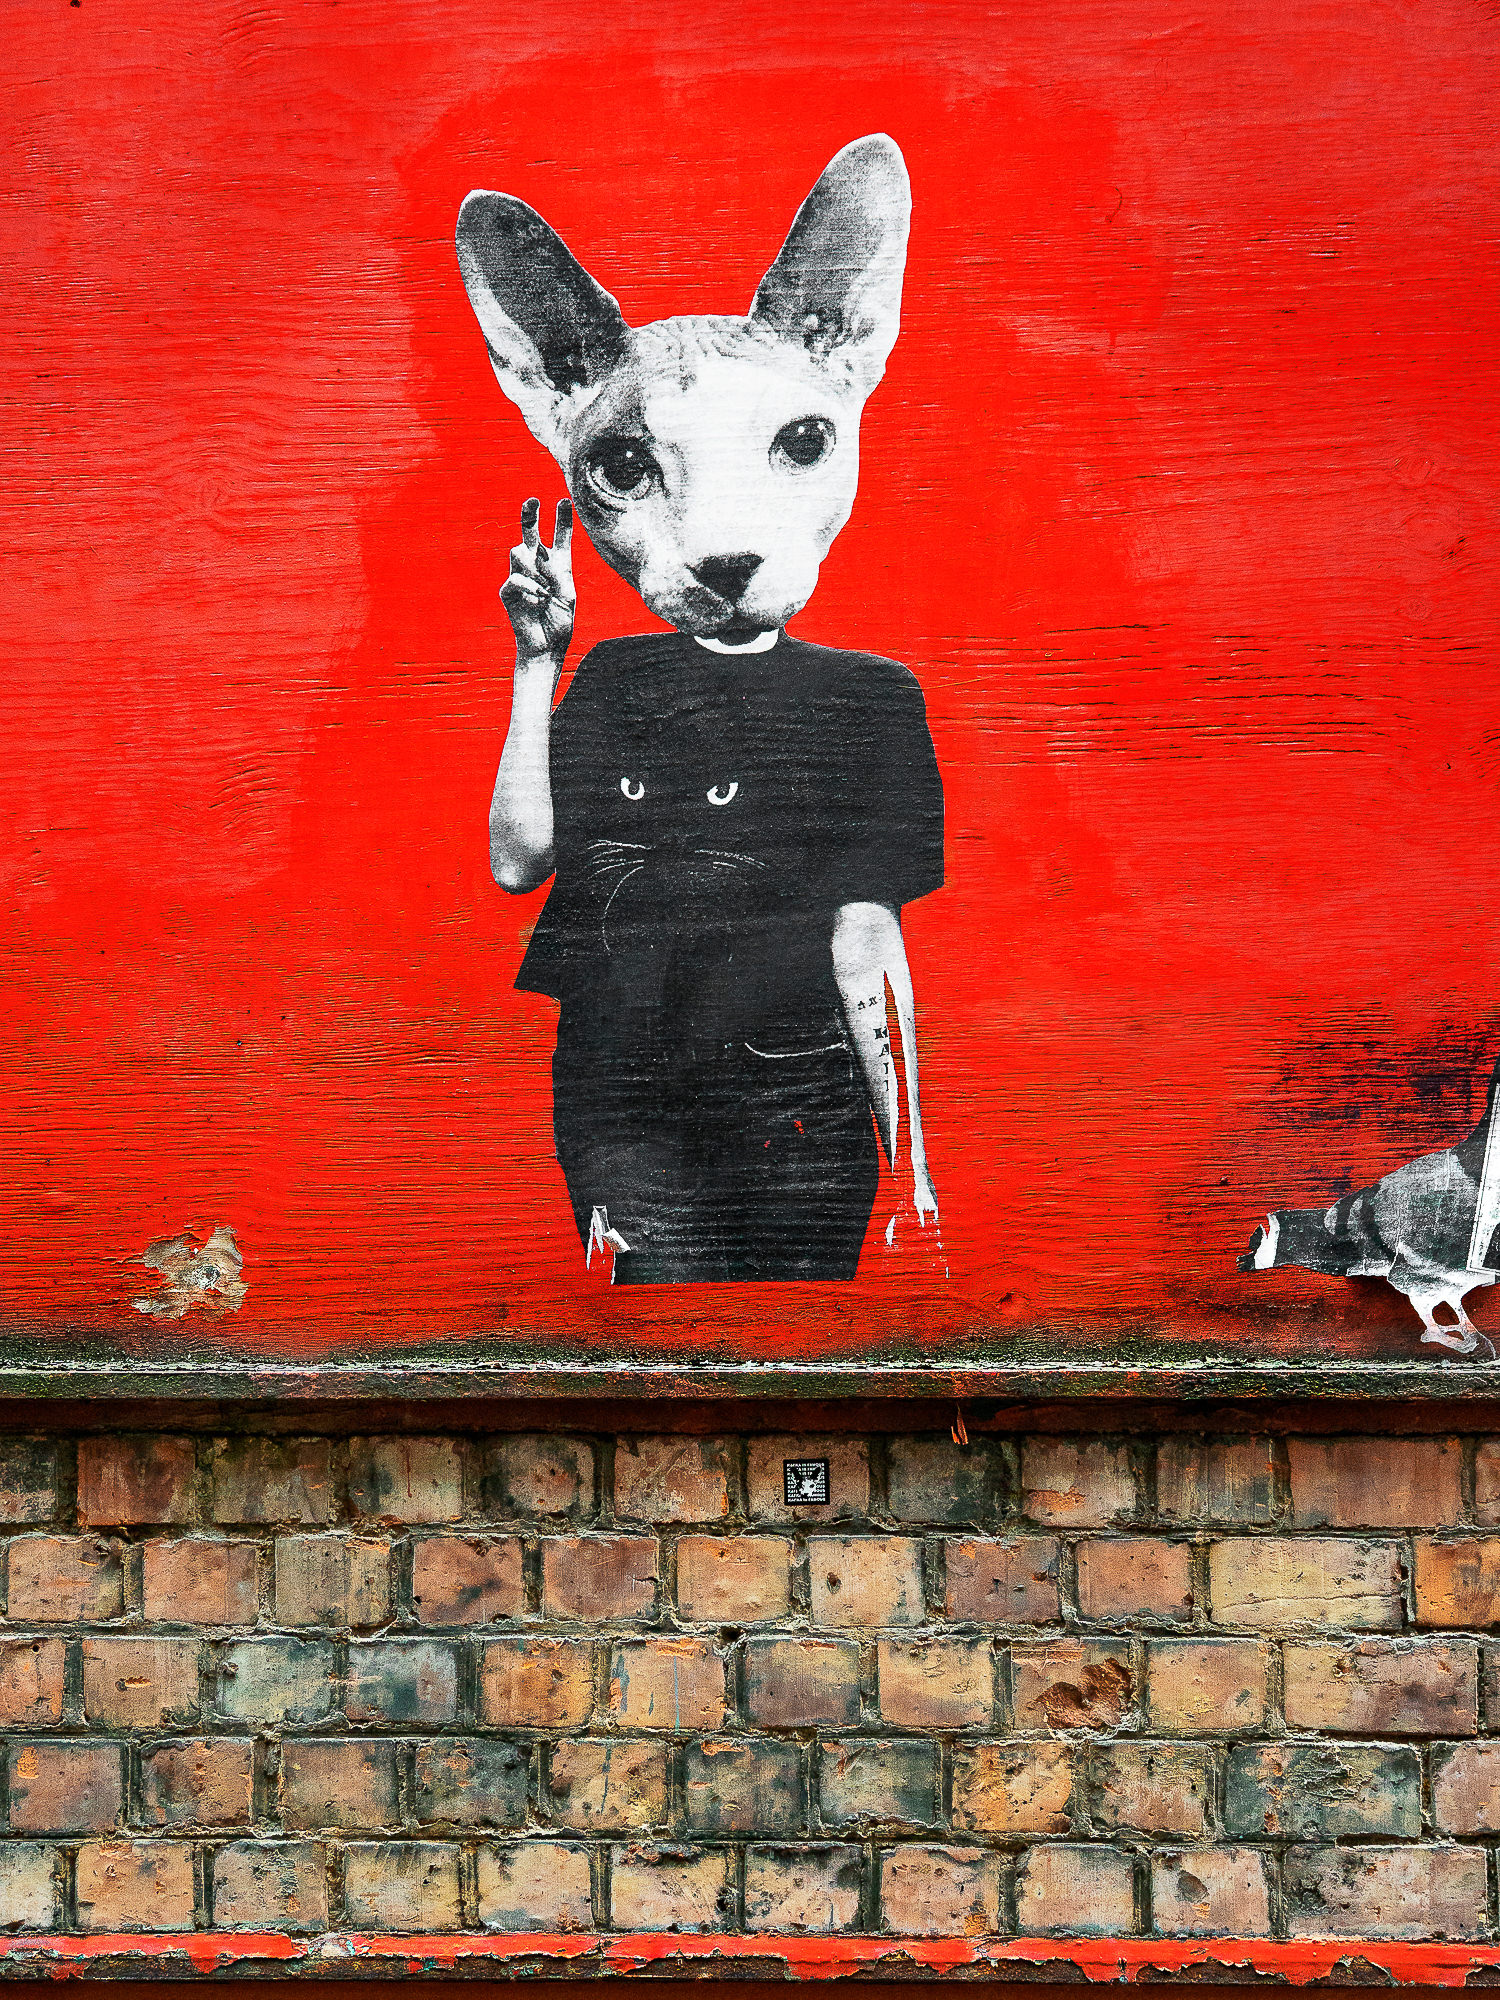 graffiti street art - Manchester UK